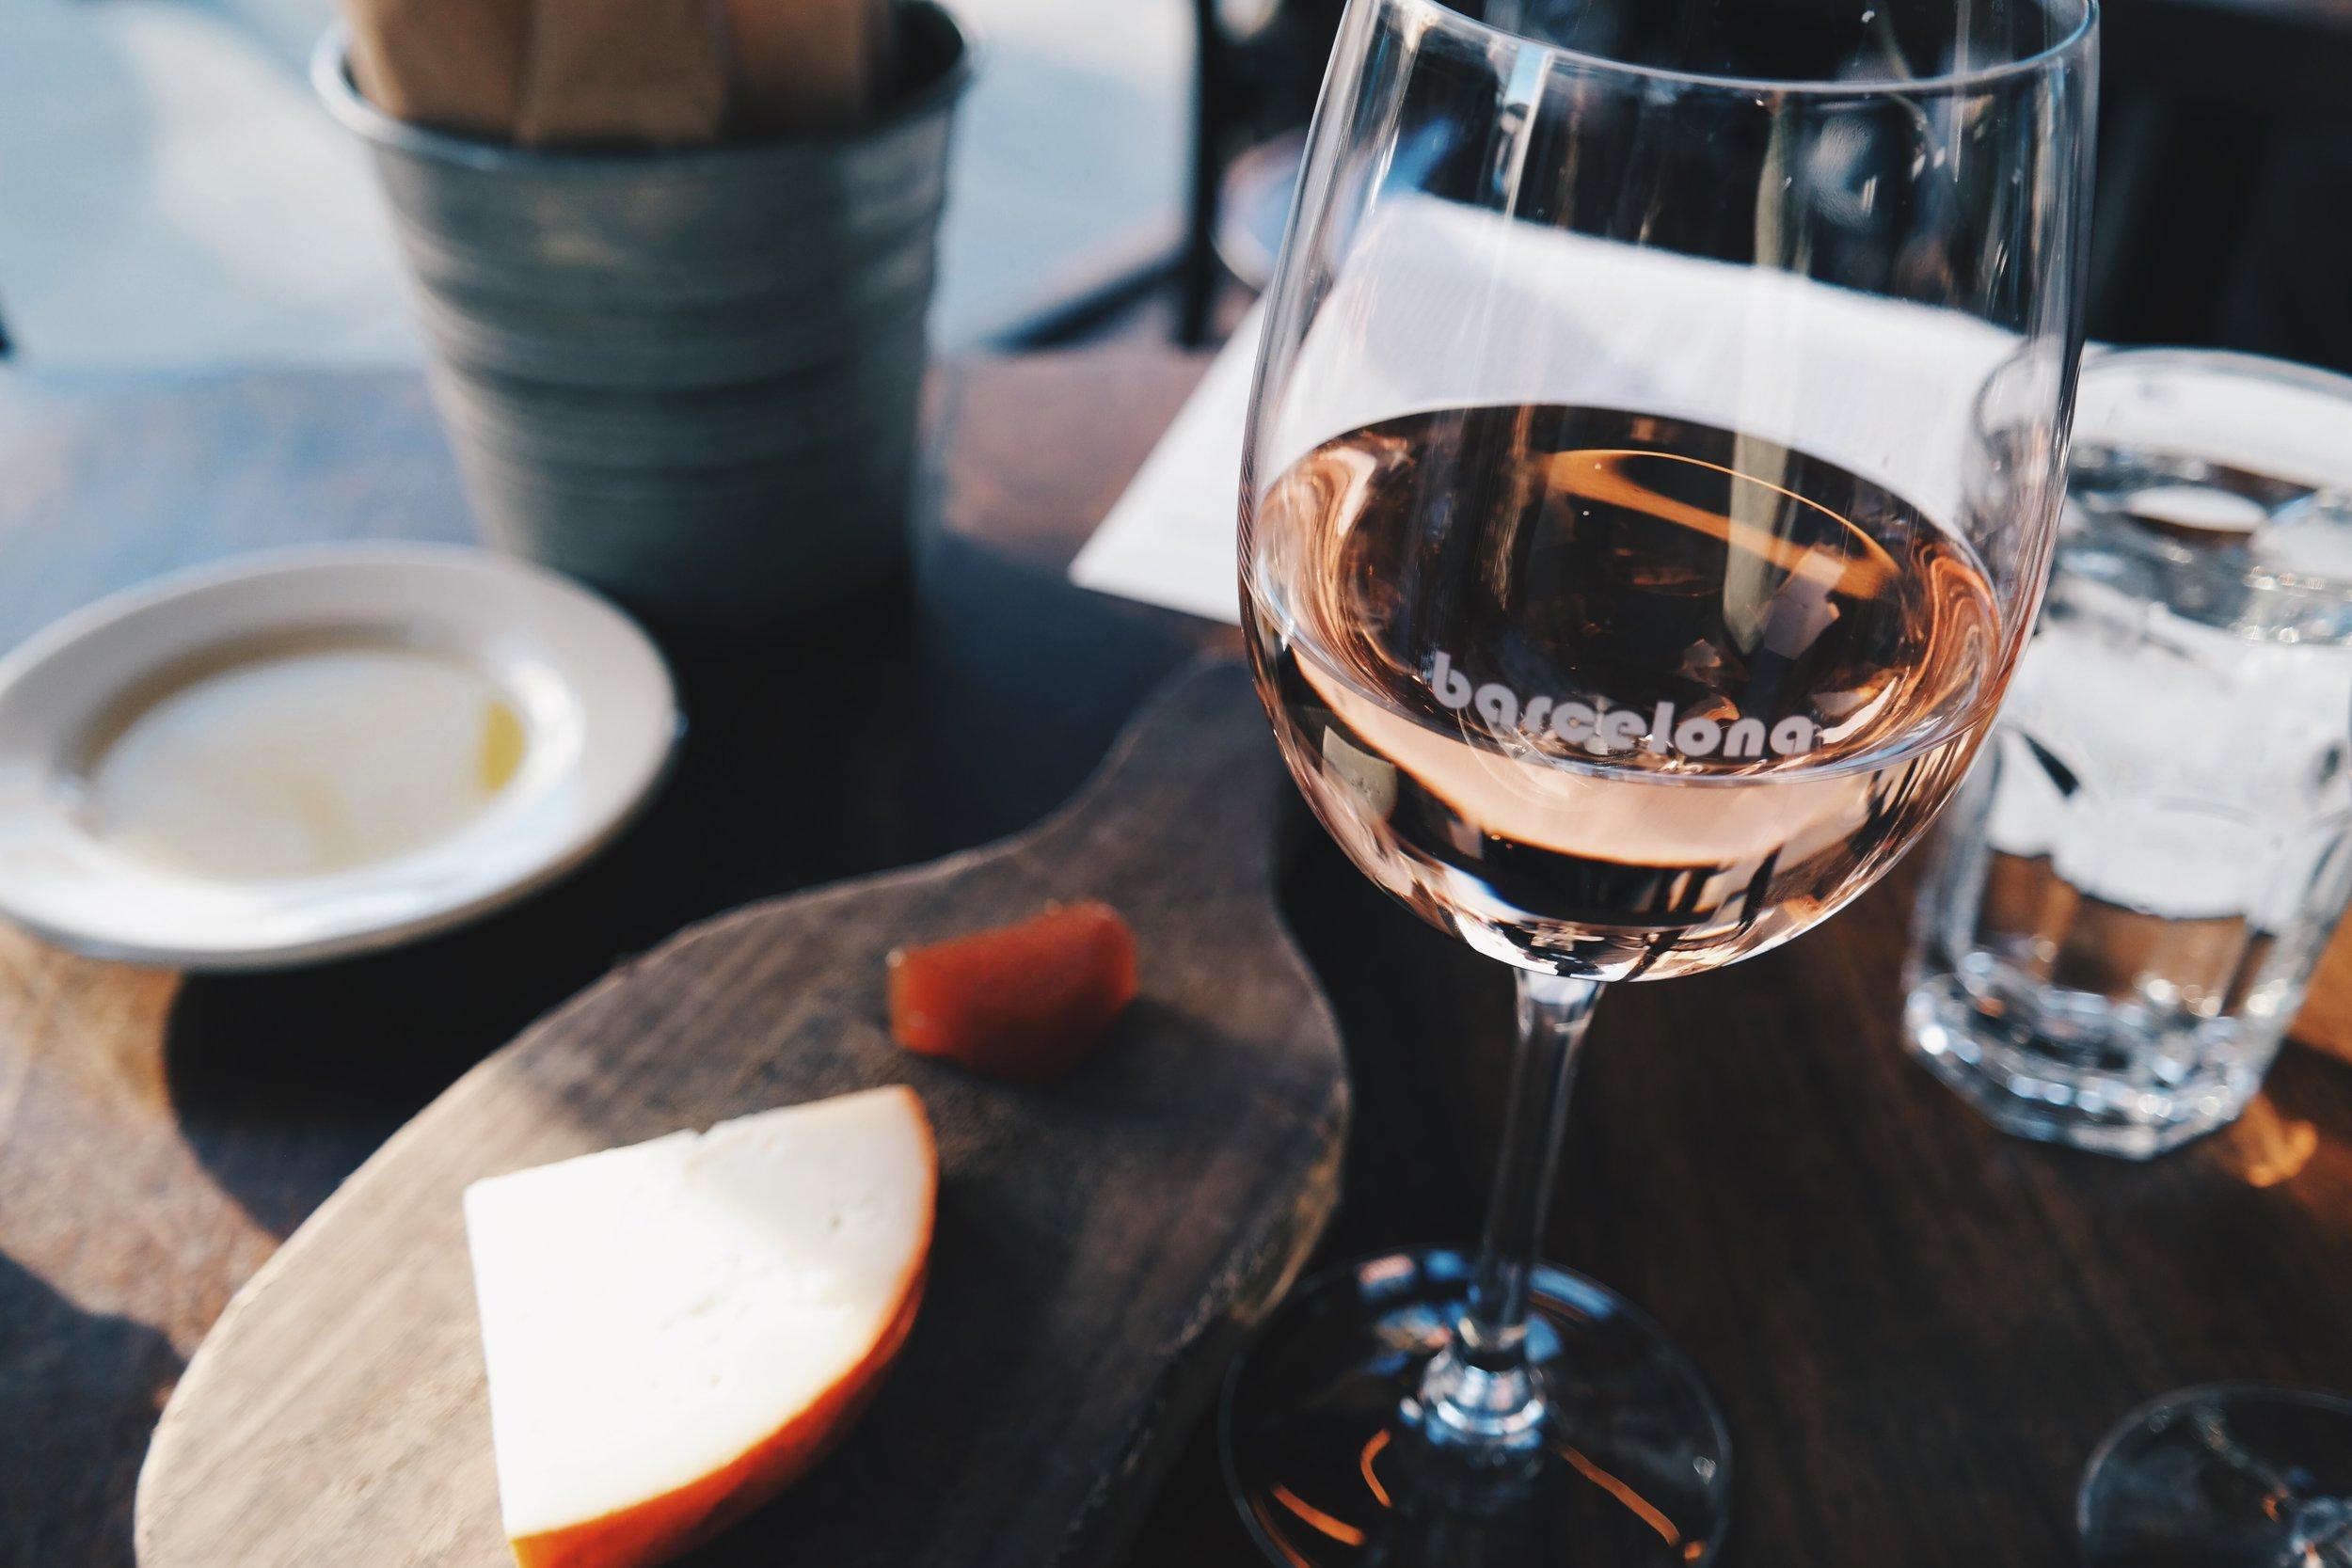 Washington DC: Late night cravings at Barcelona Wine Bar